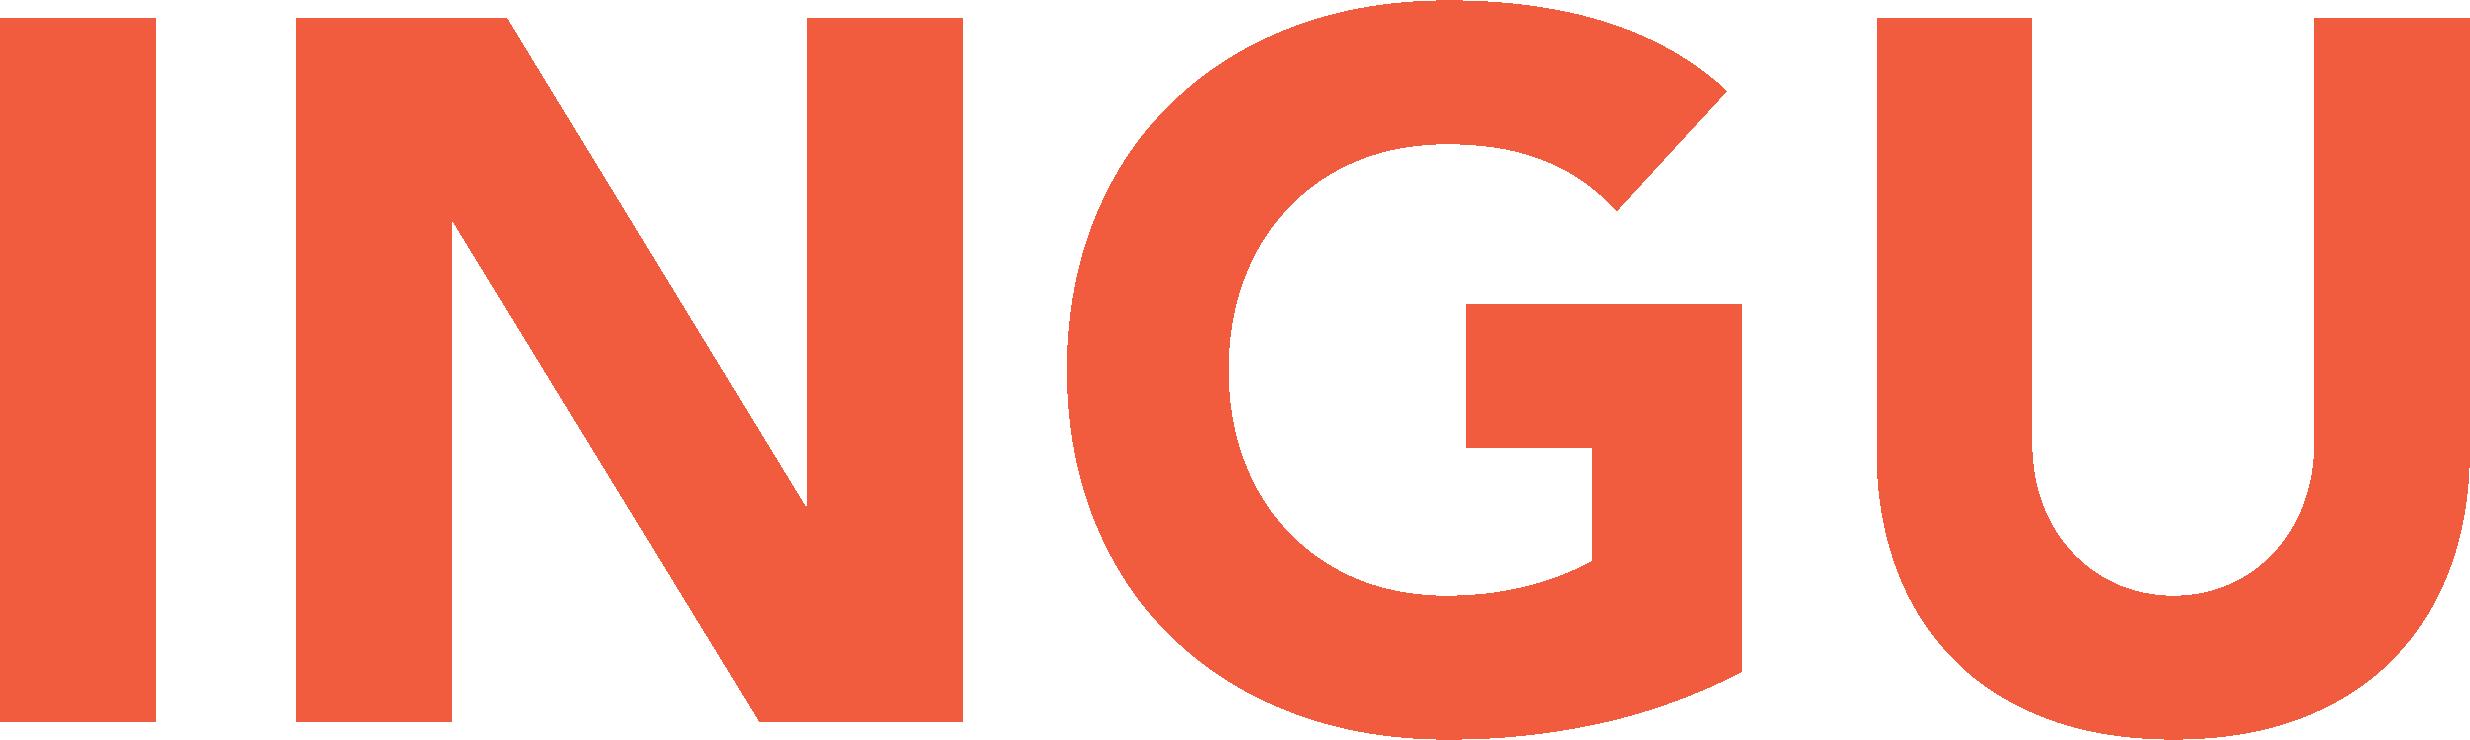 Ingu logo